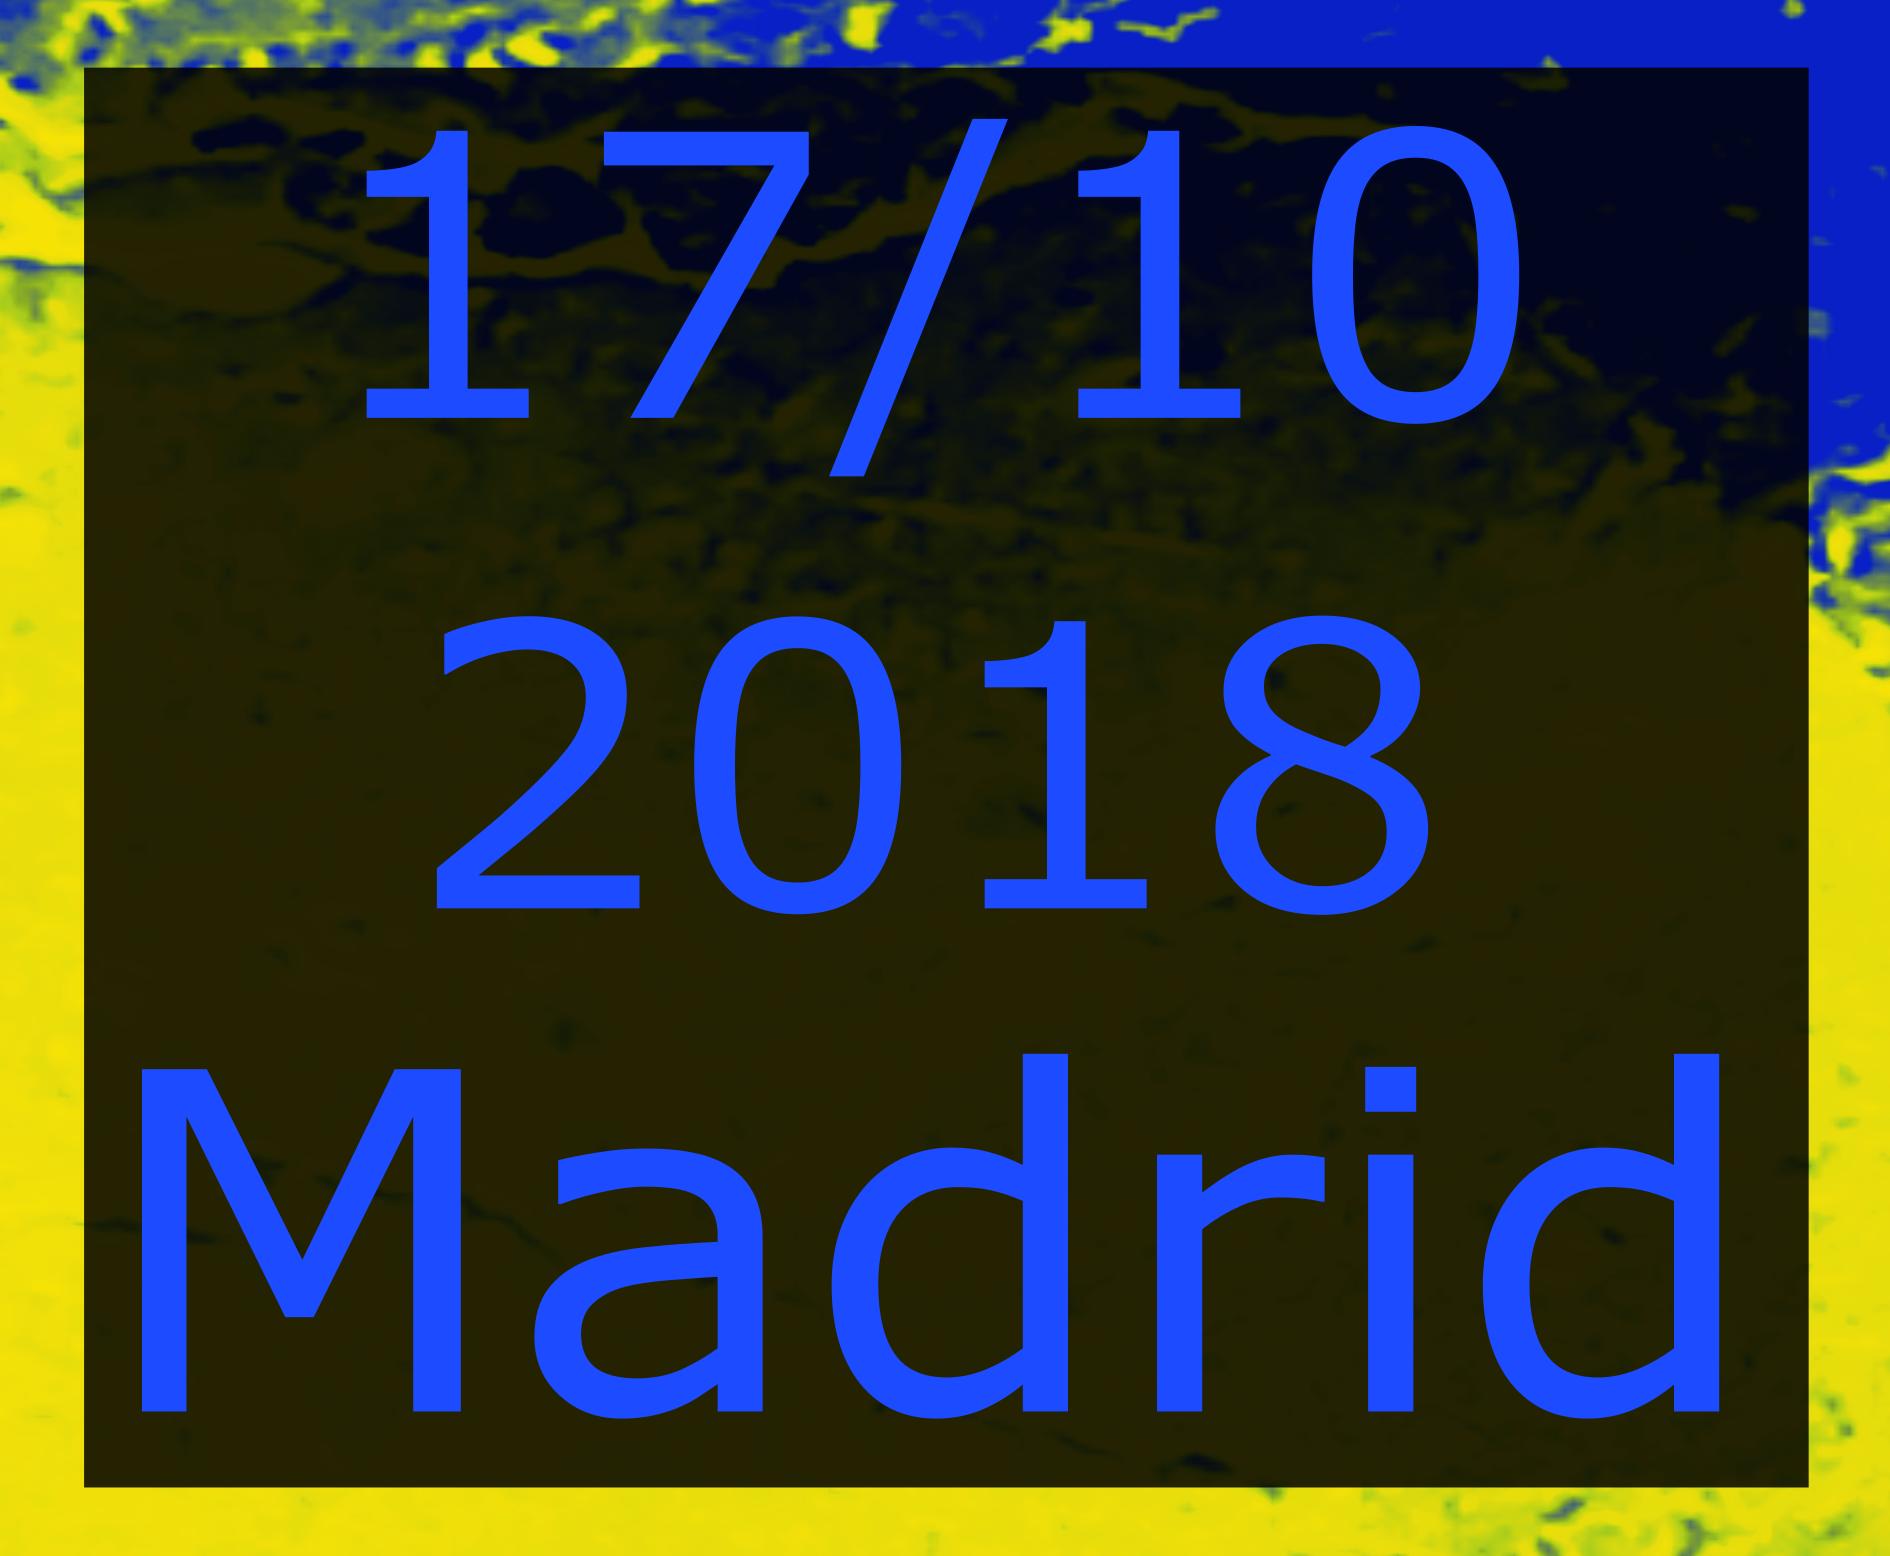 Madrid 17 ottobre 2018